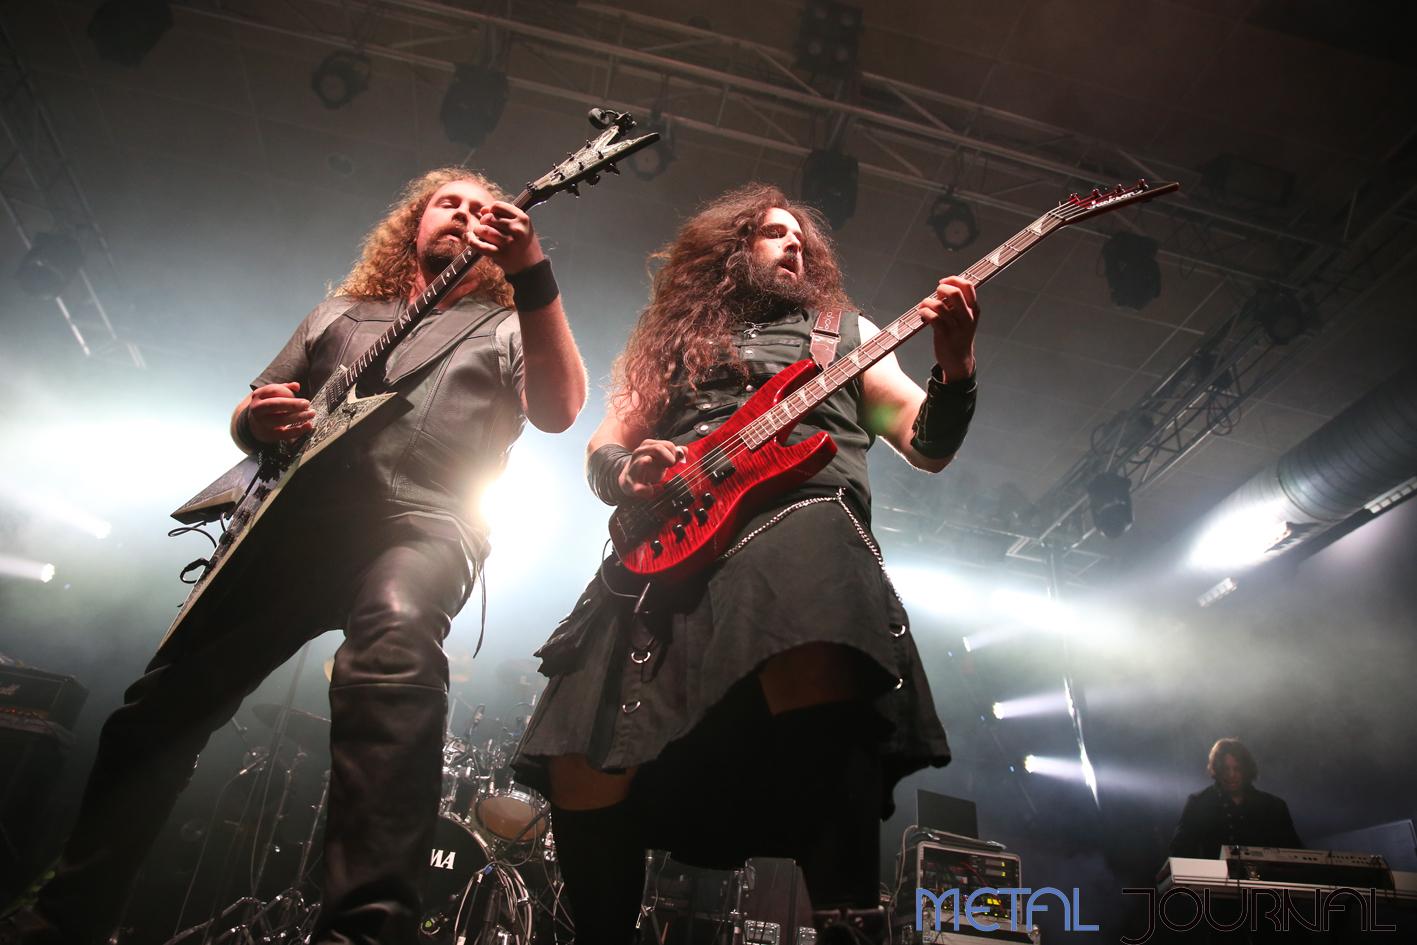 midnight eternal - metal journal bilbao 2018 pic 6